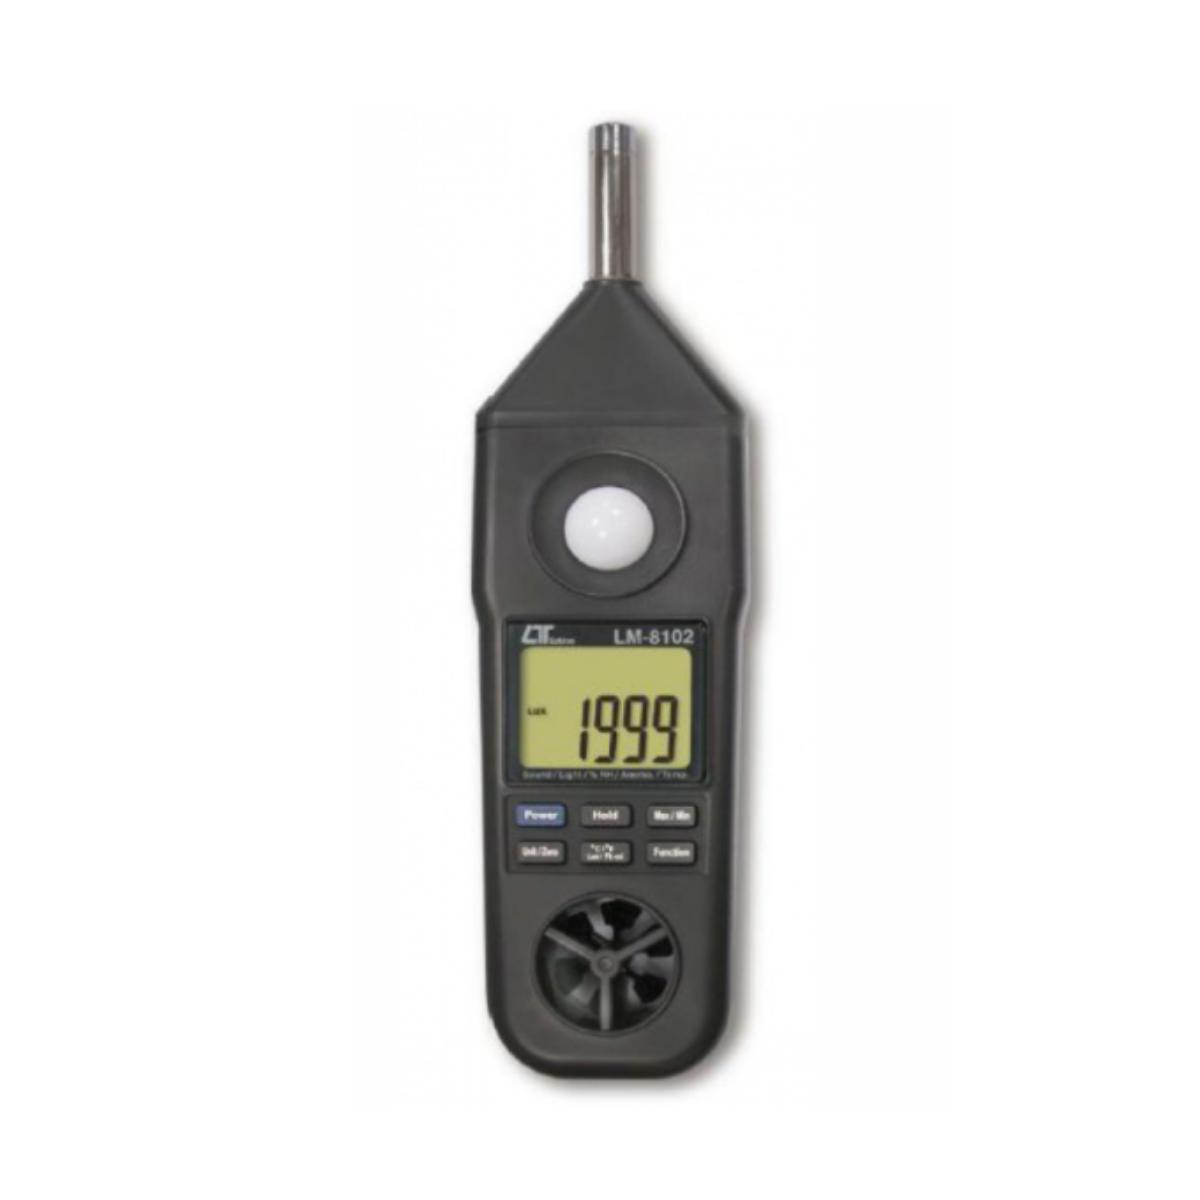 LUTRON LM-8102 5-IN-1 ENVIRONMENTAL METER